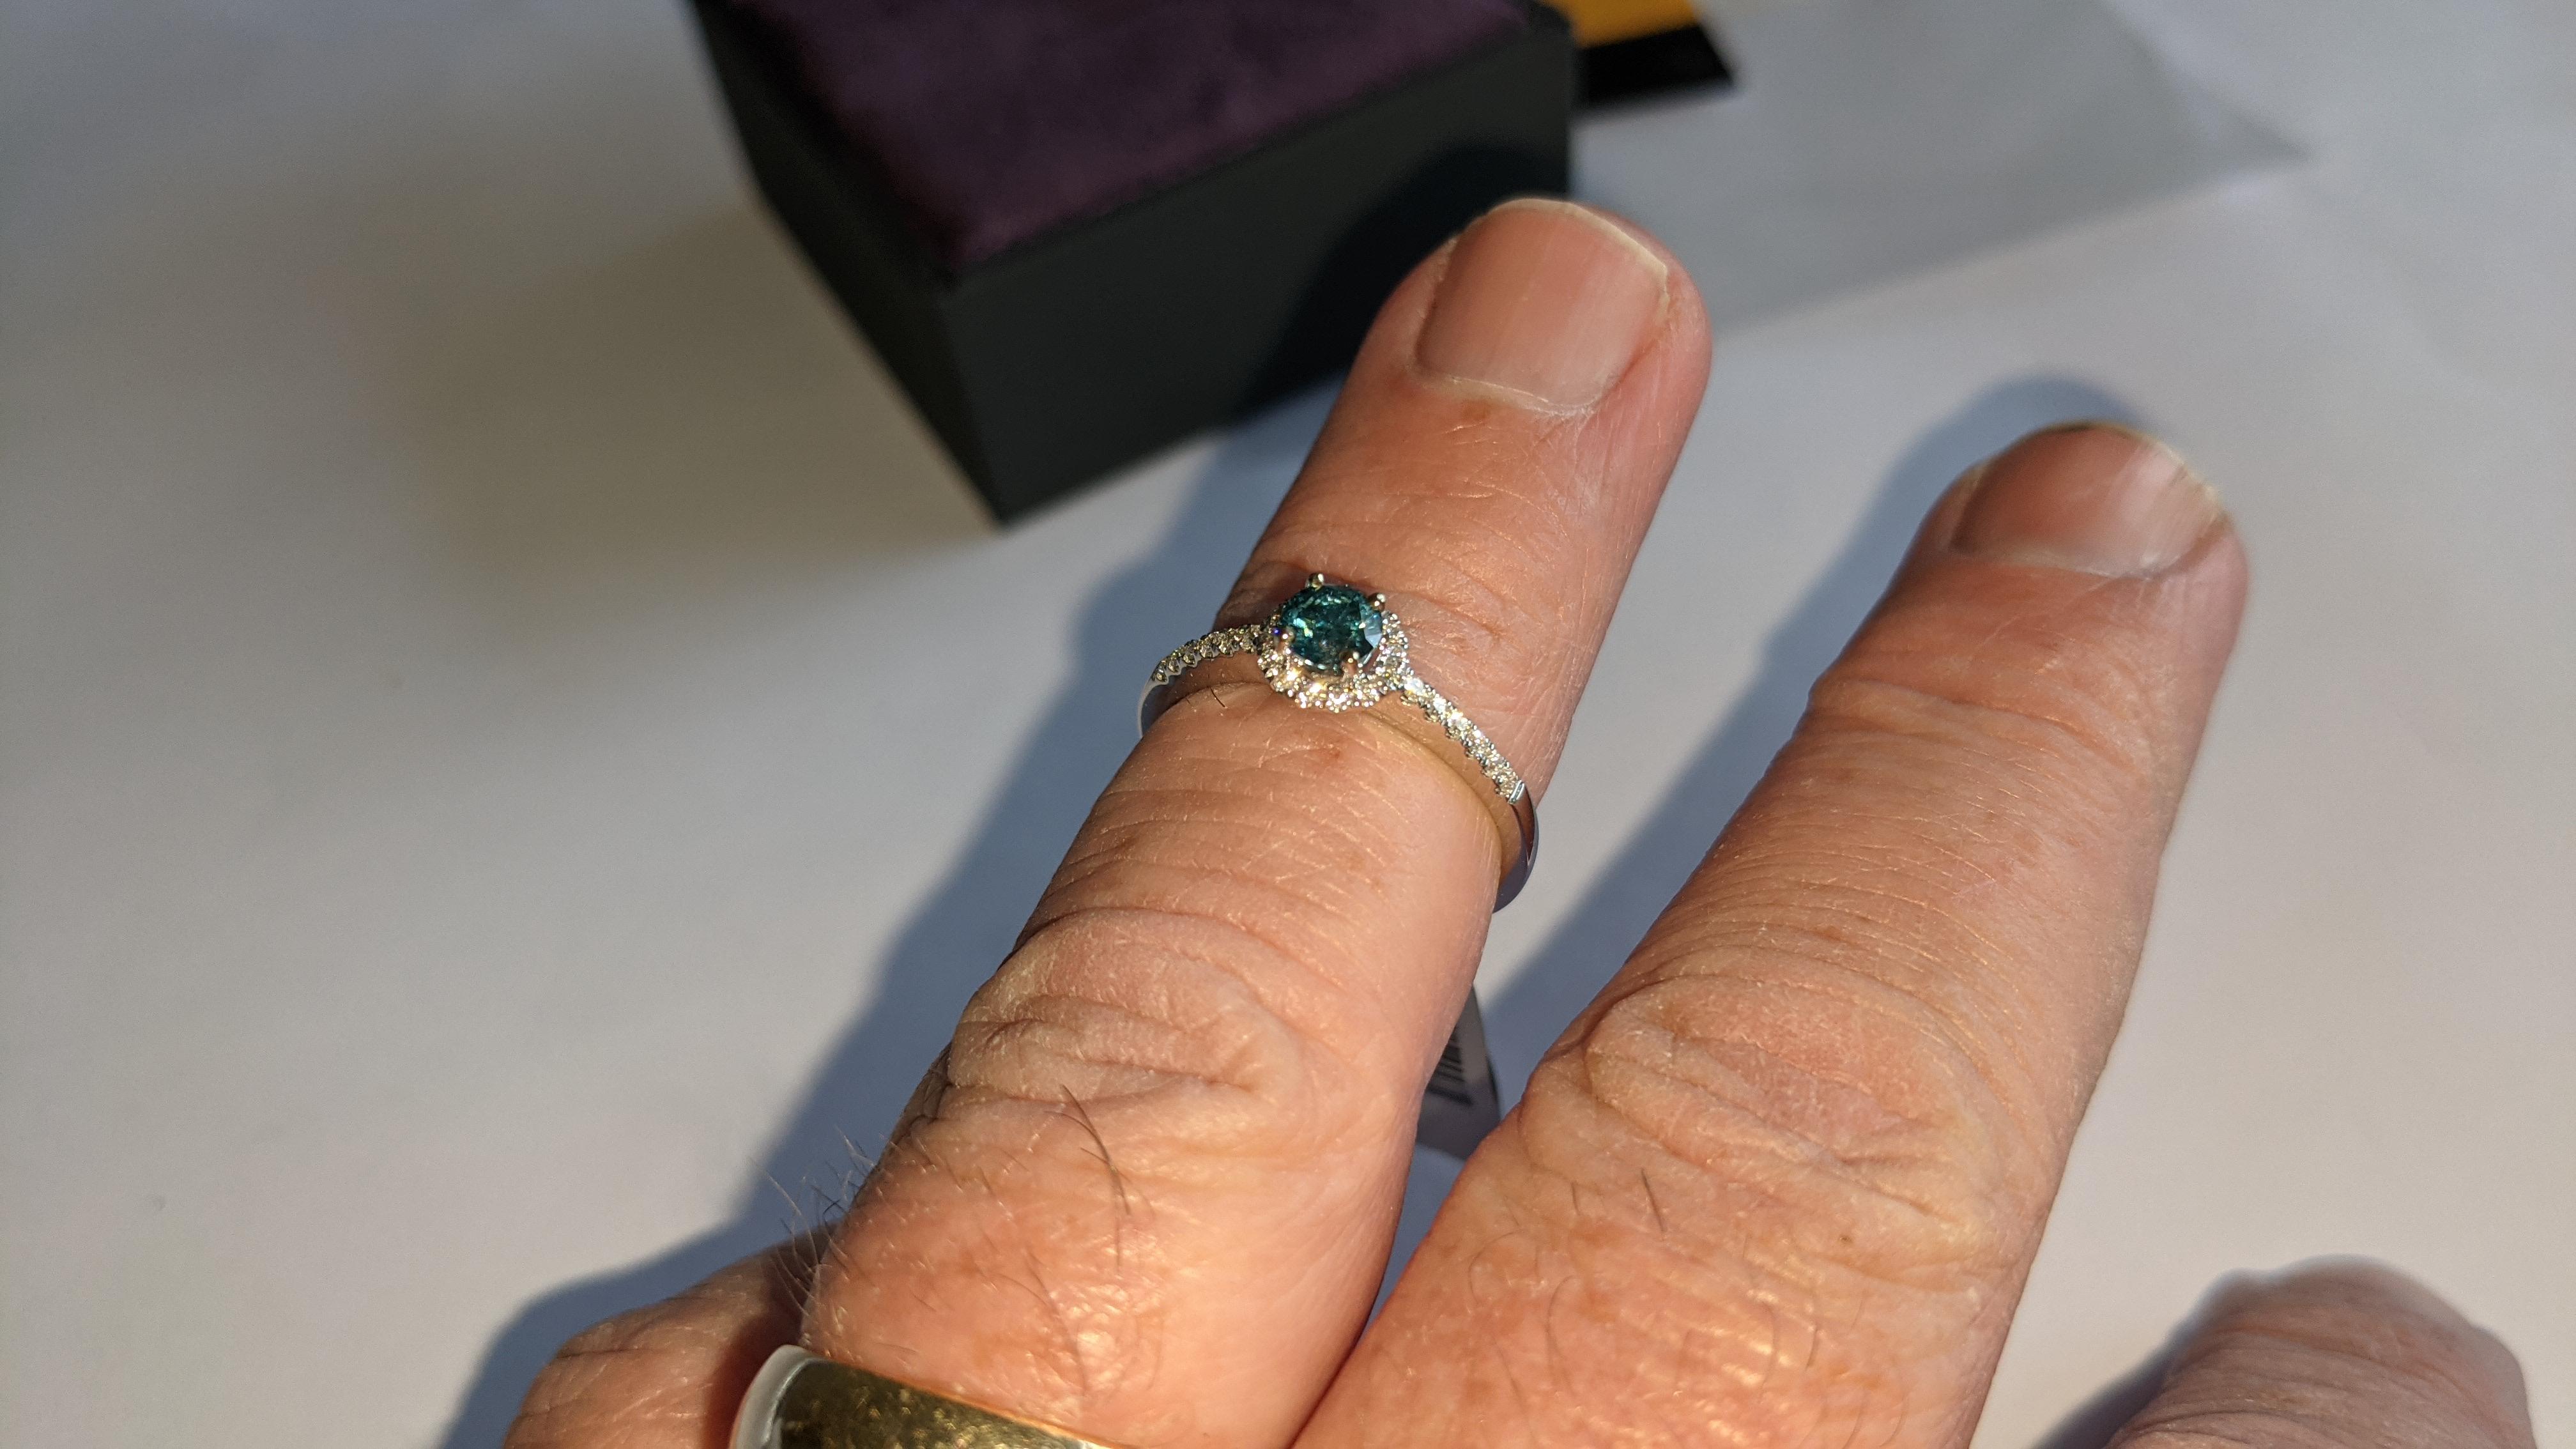 18ct white gold & diamond ring with 0.30ct blue diamond & 0.1ct of additional diamonds around the ce - Image 17 of 19